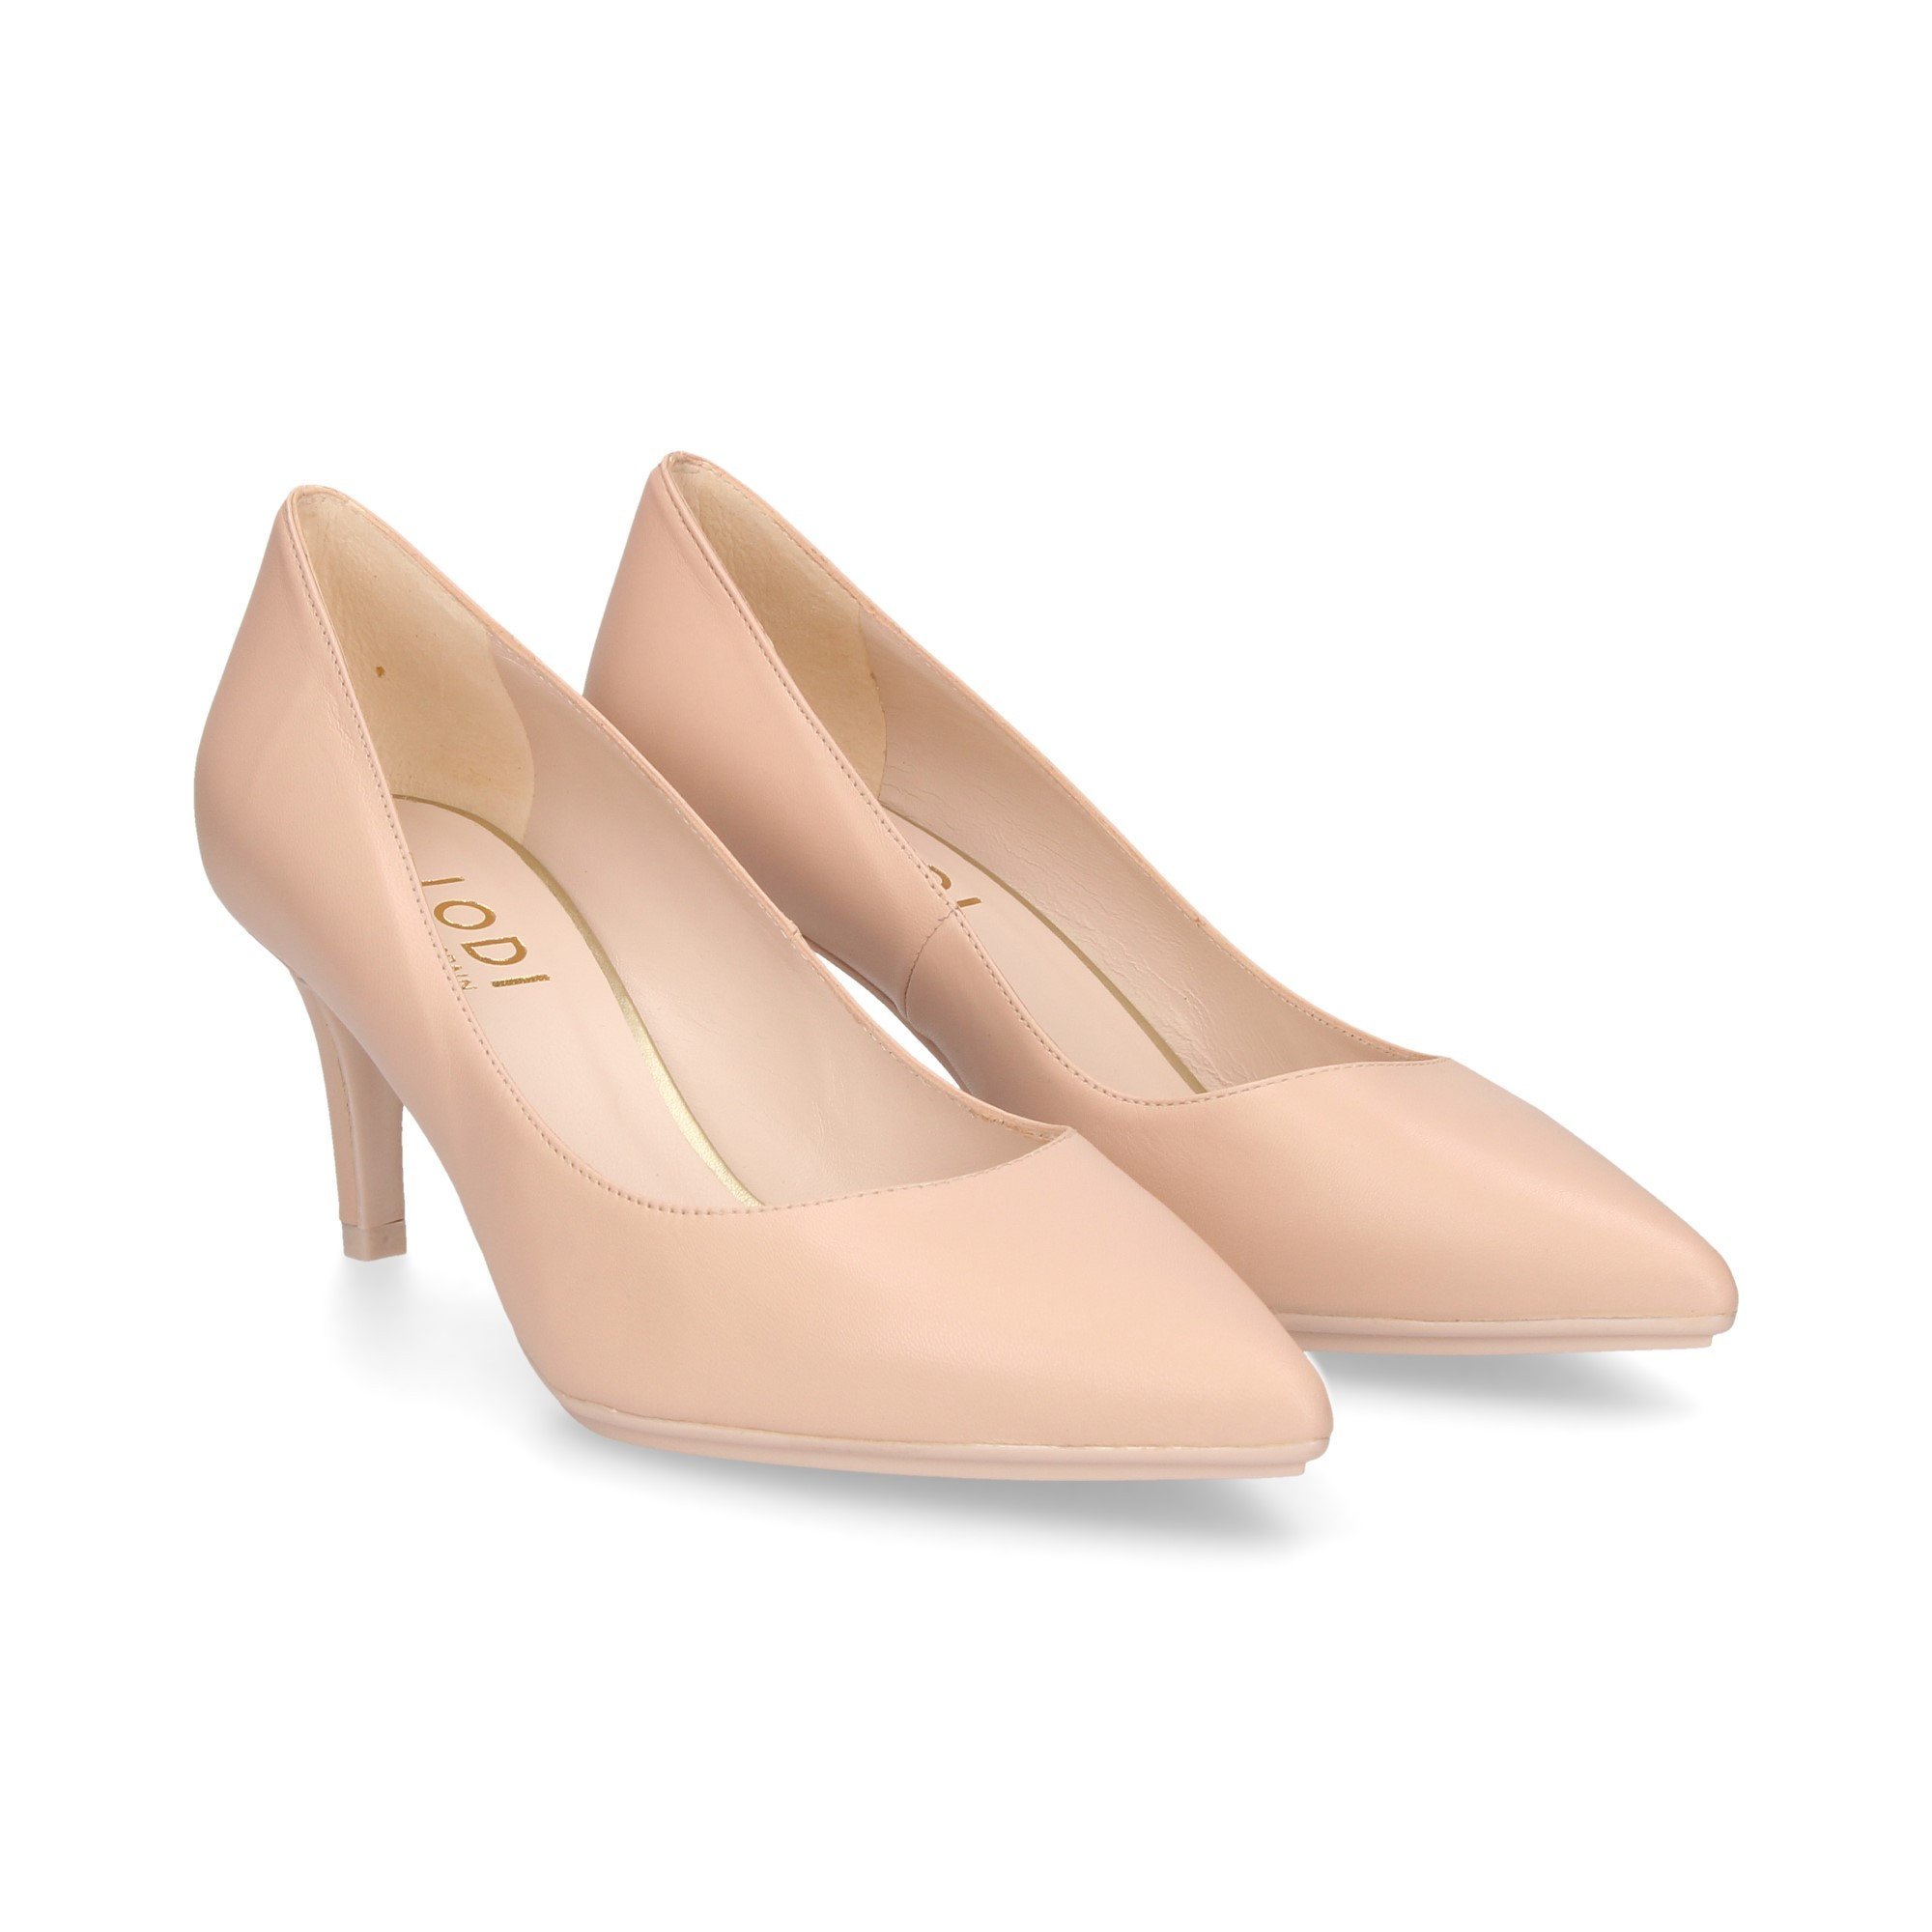 4825a806 LODI Zapatos de salón EDURNE-GO SWEET NUDE